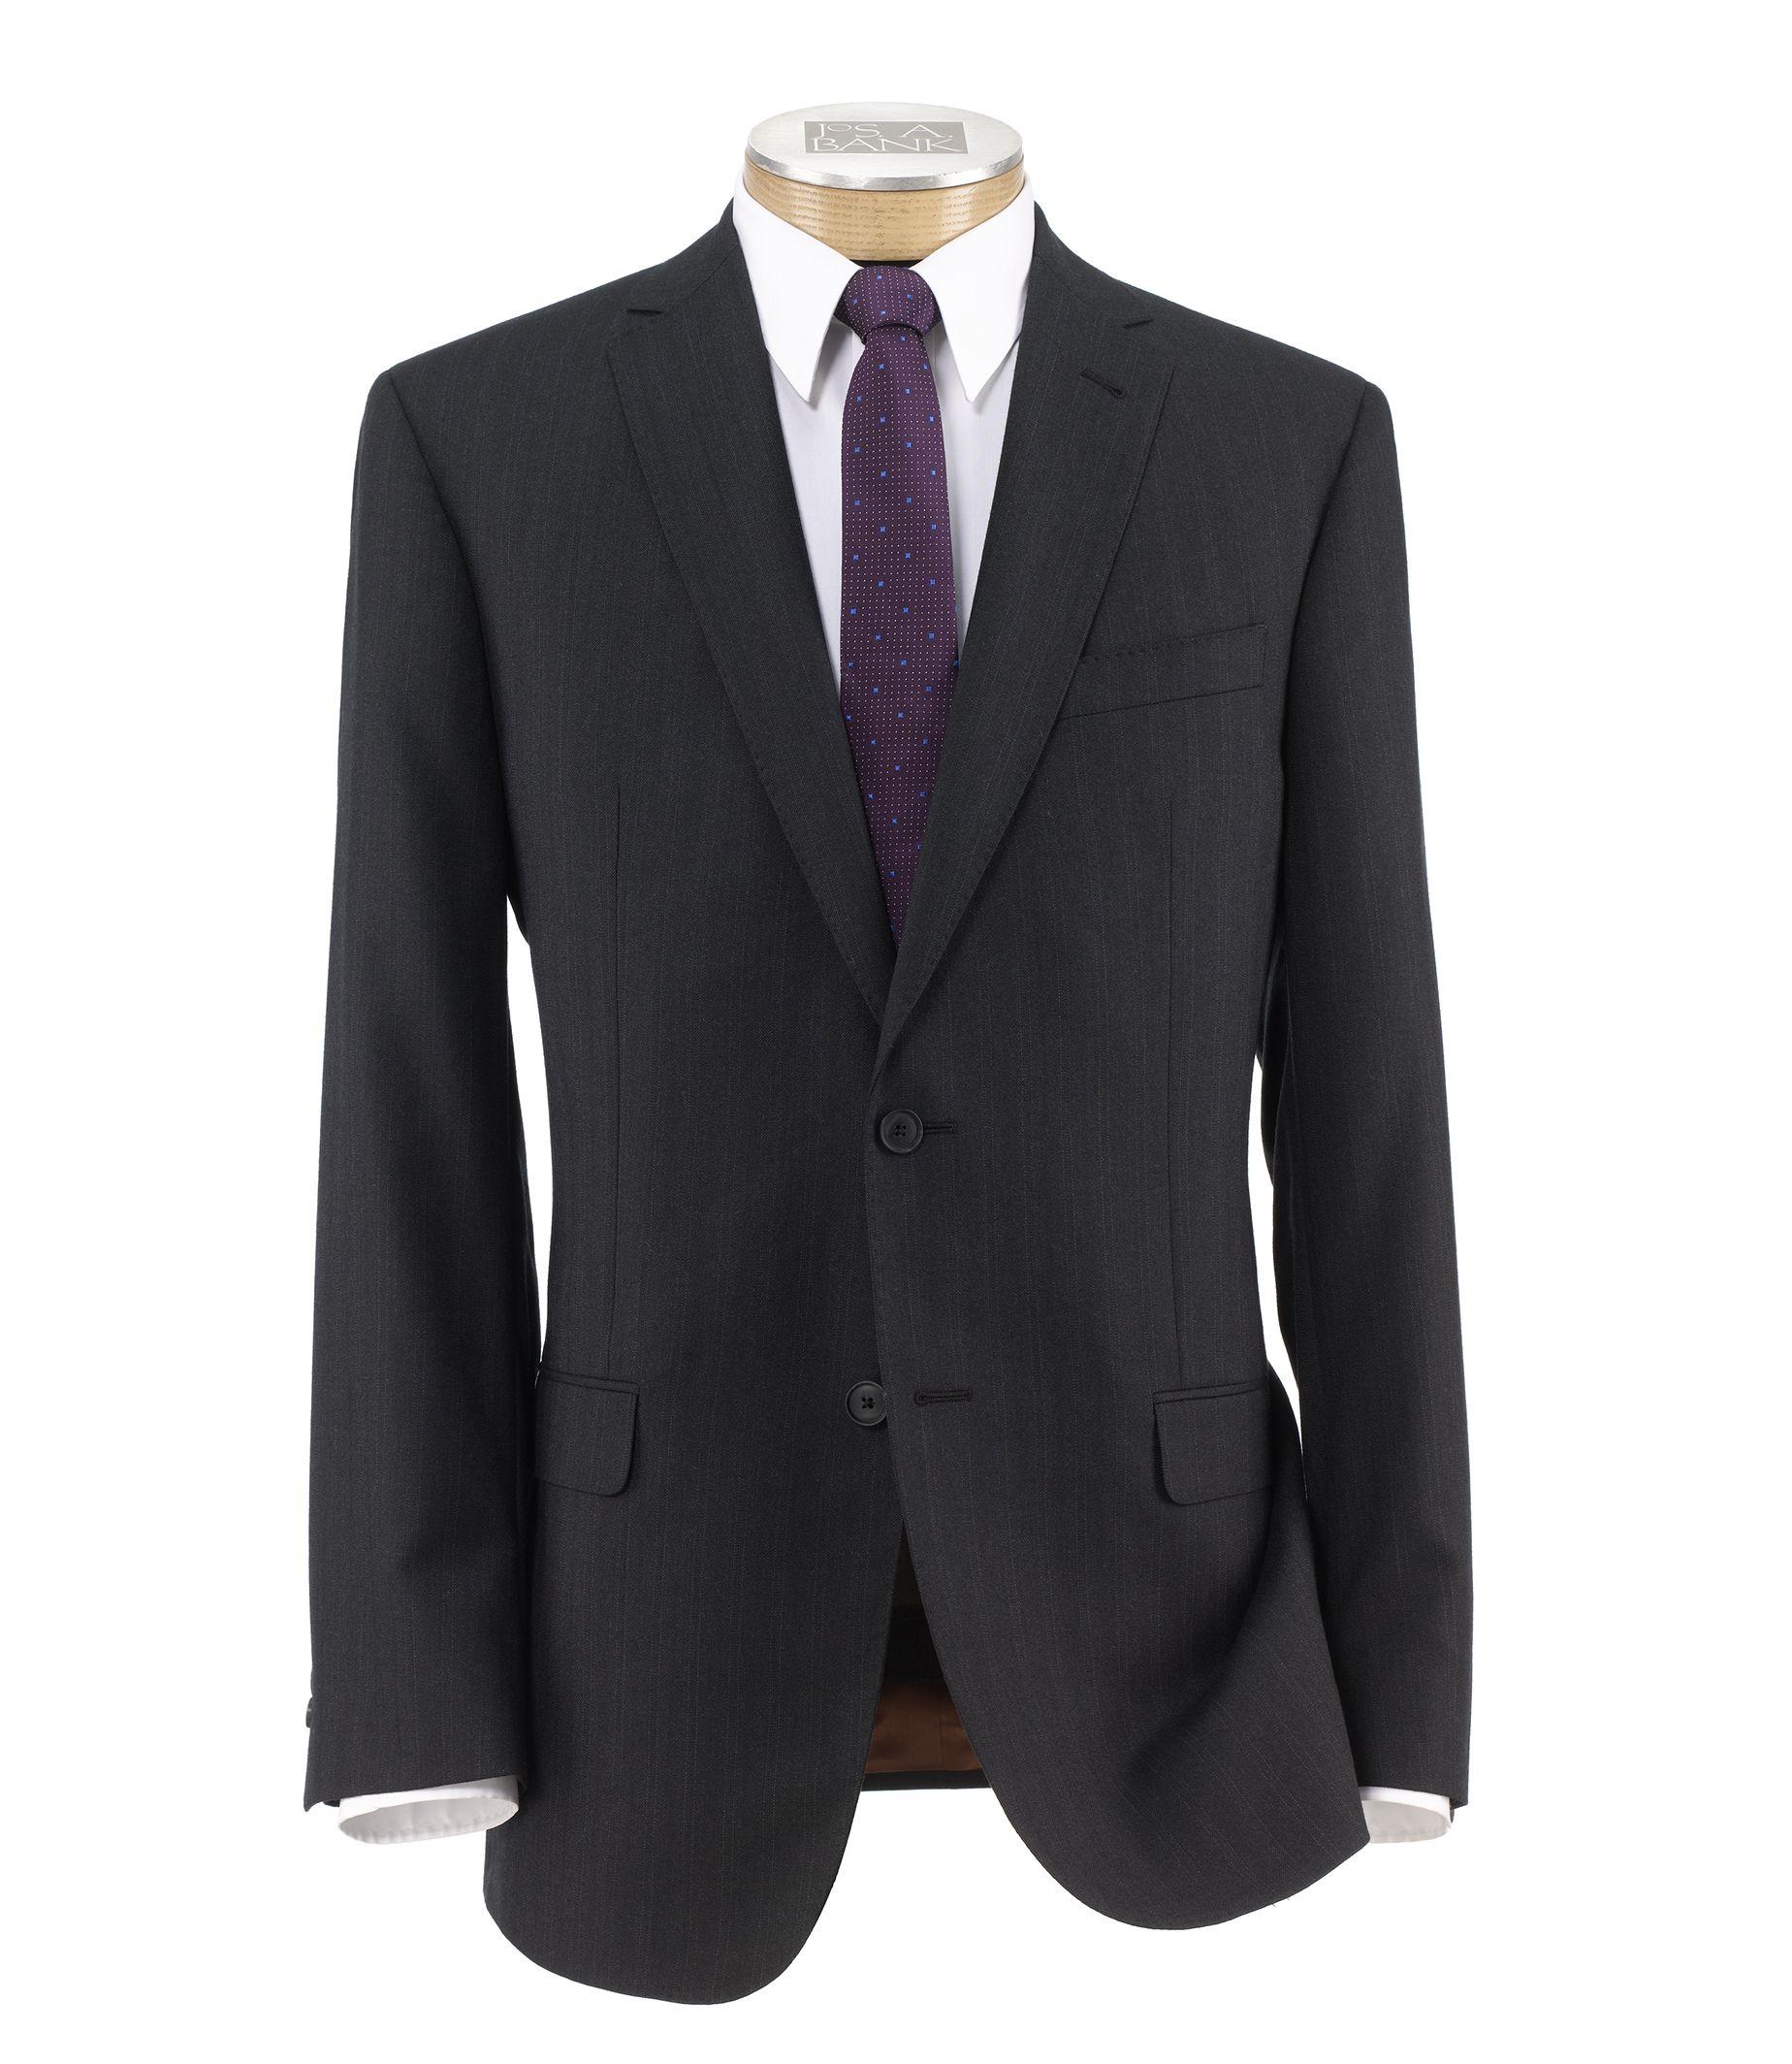 Joseph Slim Fit 2 Button Plain Front Wool Suit- Charcoal Striped Milled